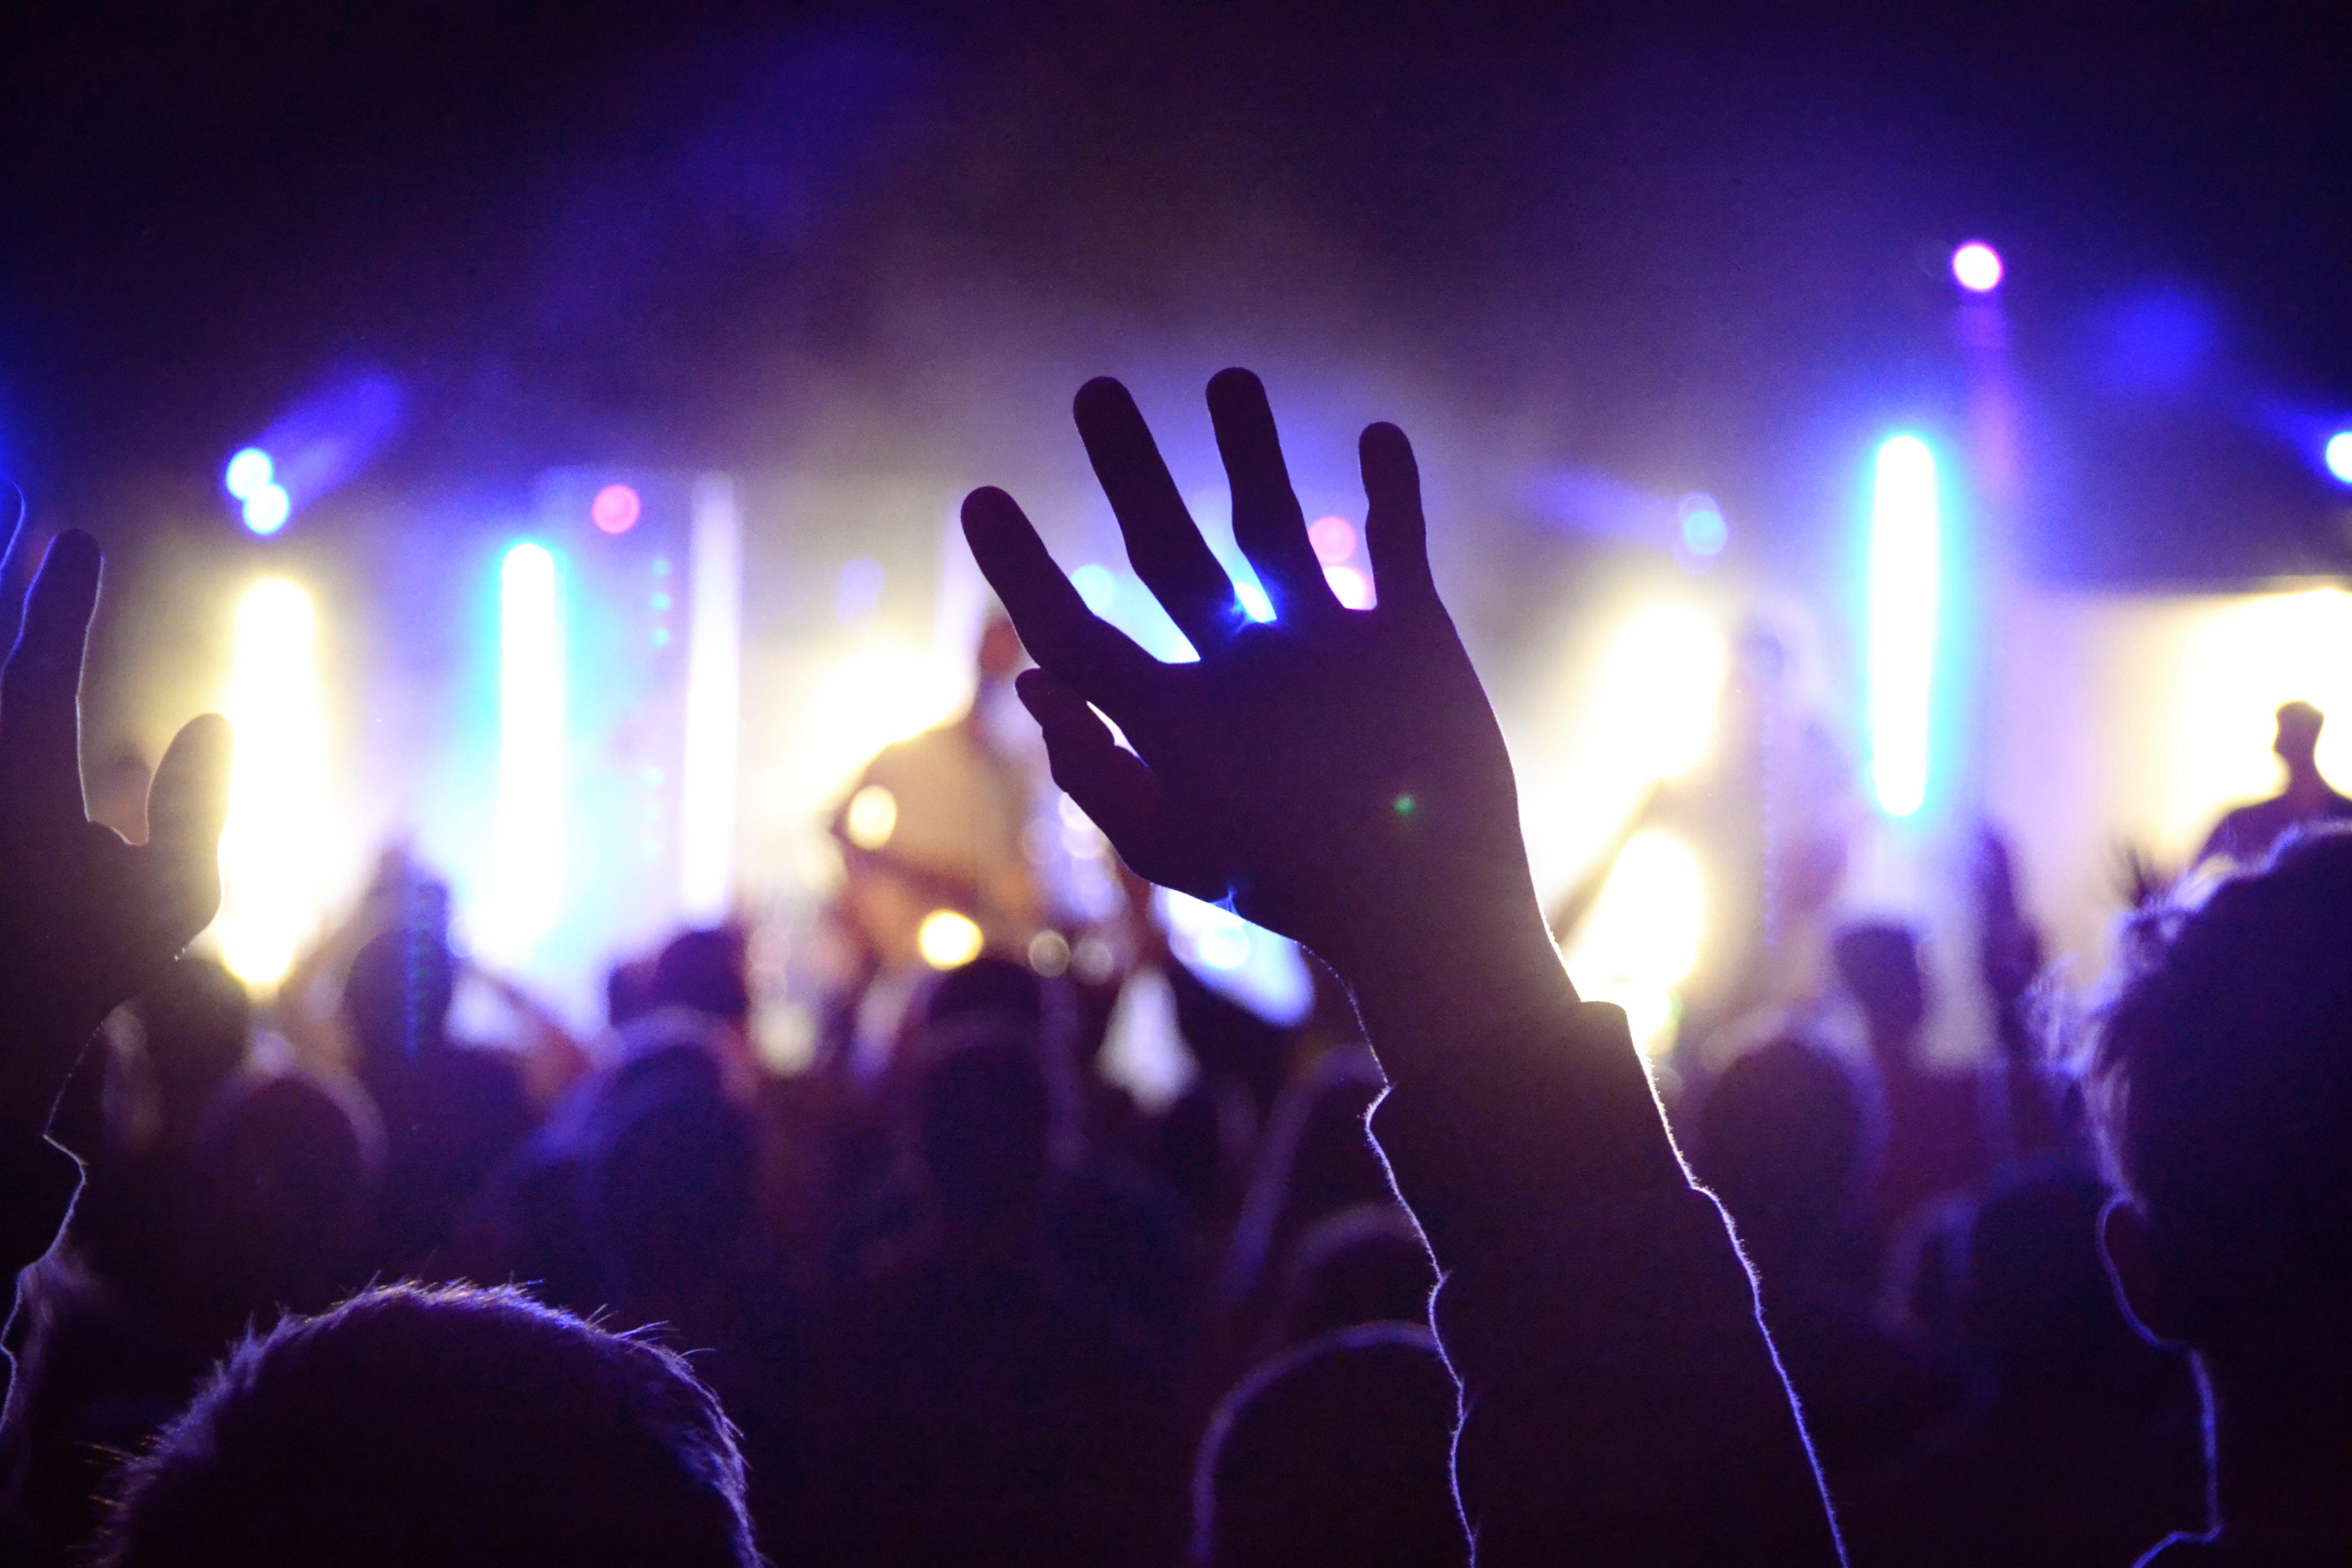 London festival goers enjoy music